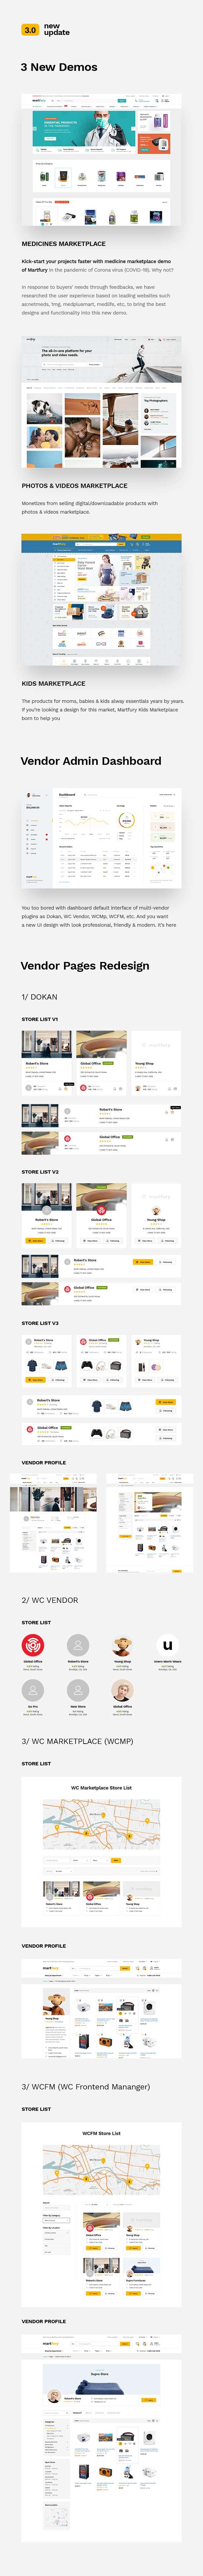 MartFury | Multi-Vendor & Marketplace eCommerce PSD Template - 10